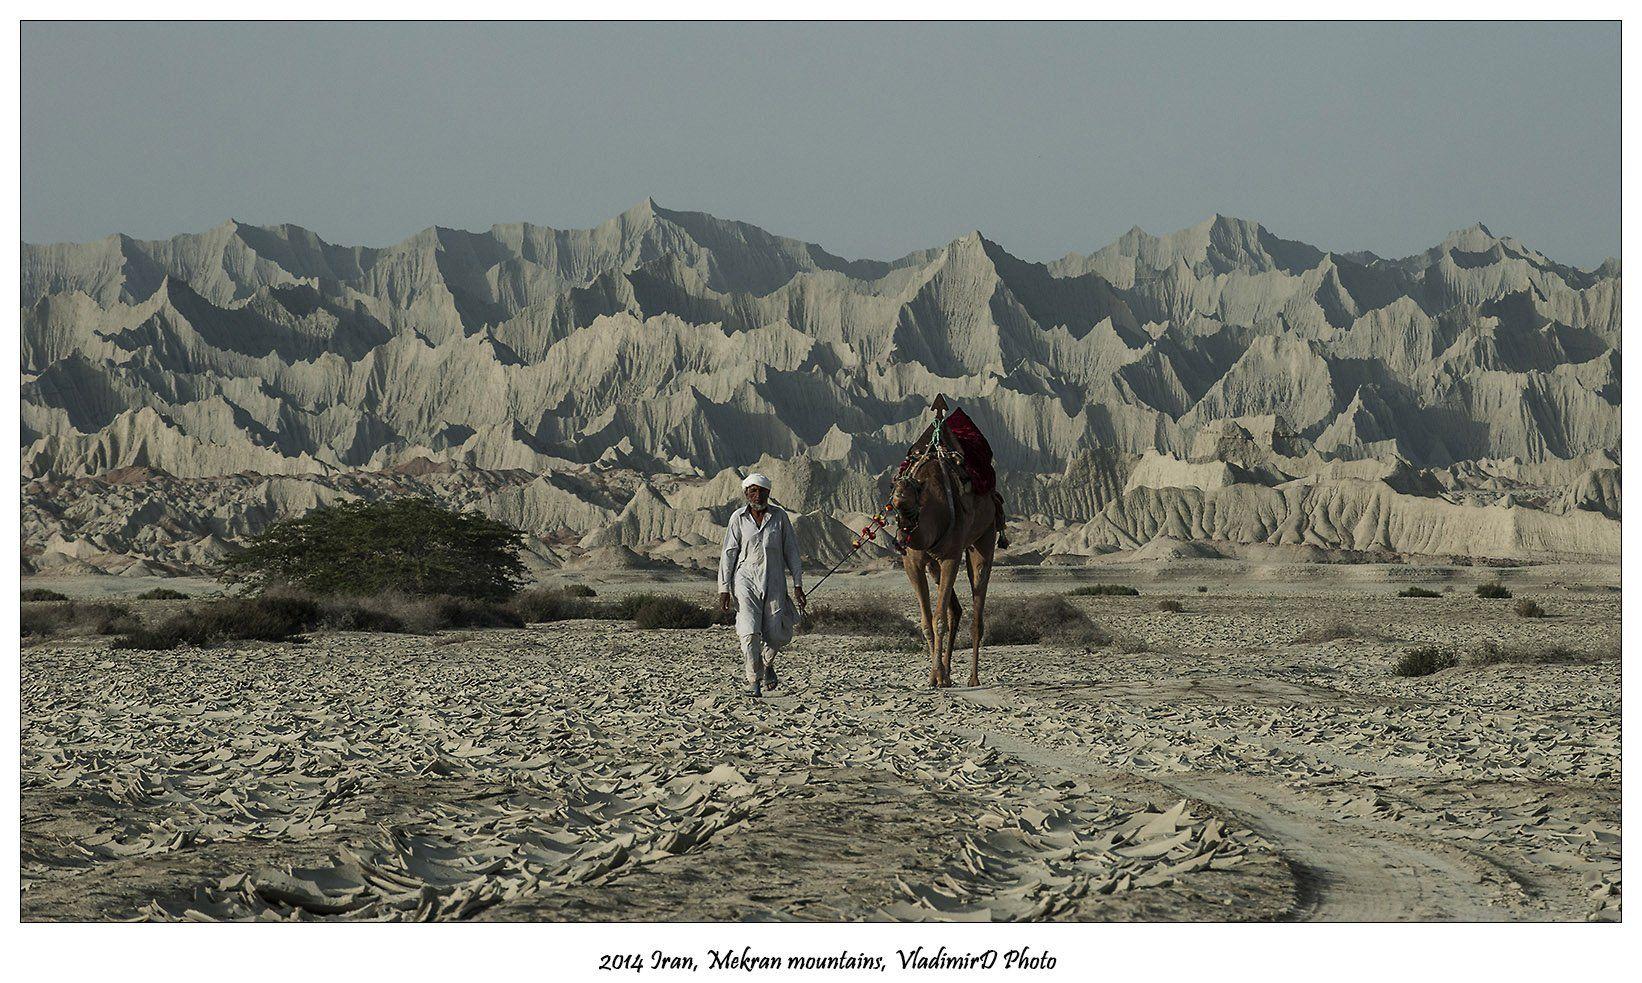 Верблюды, Иран, Мекран, VladimirD